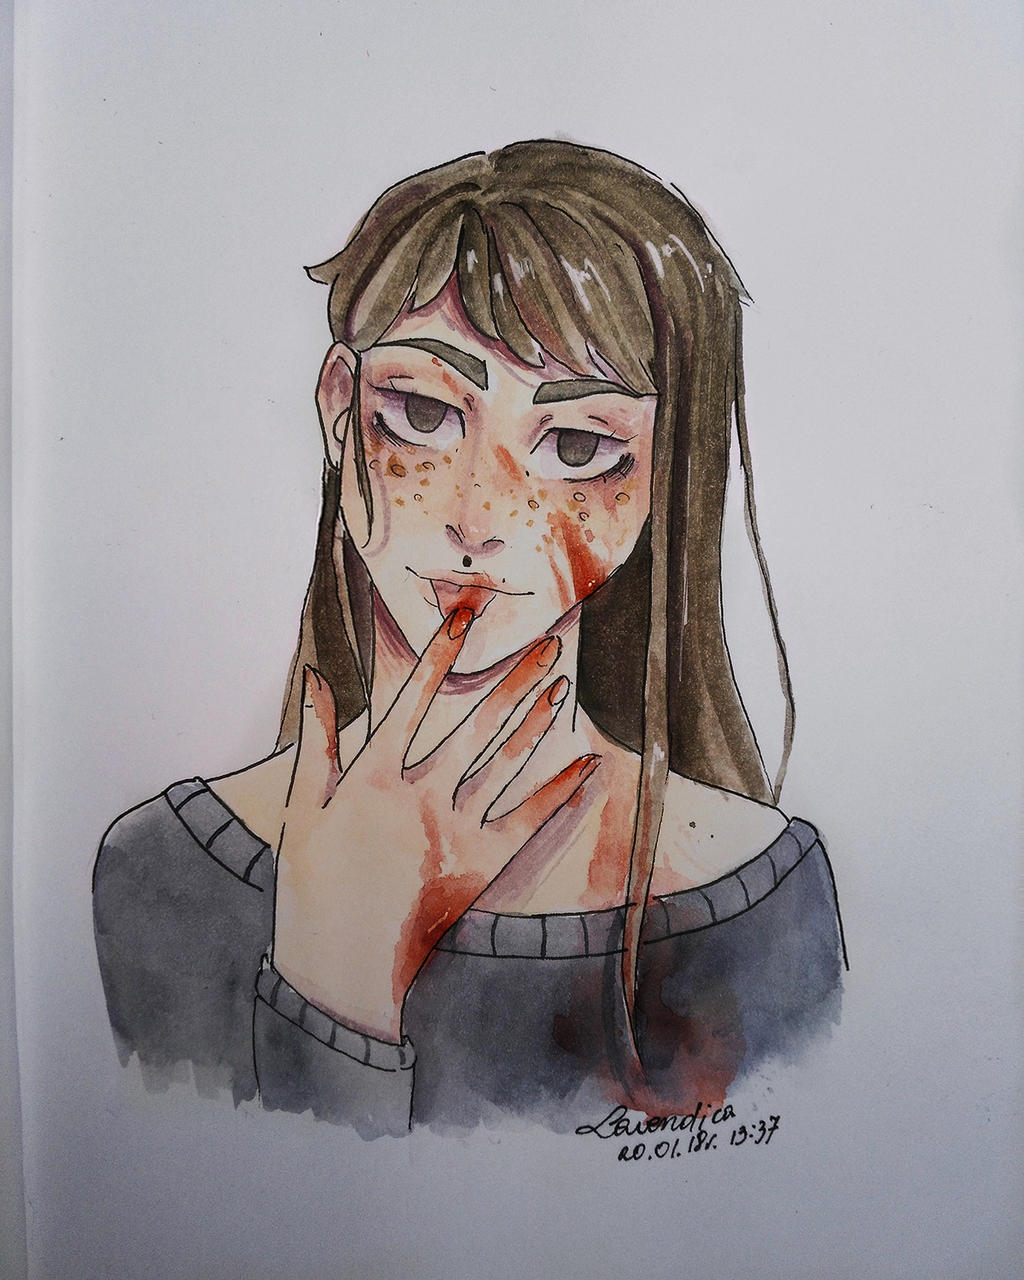 Blood by Lavendica